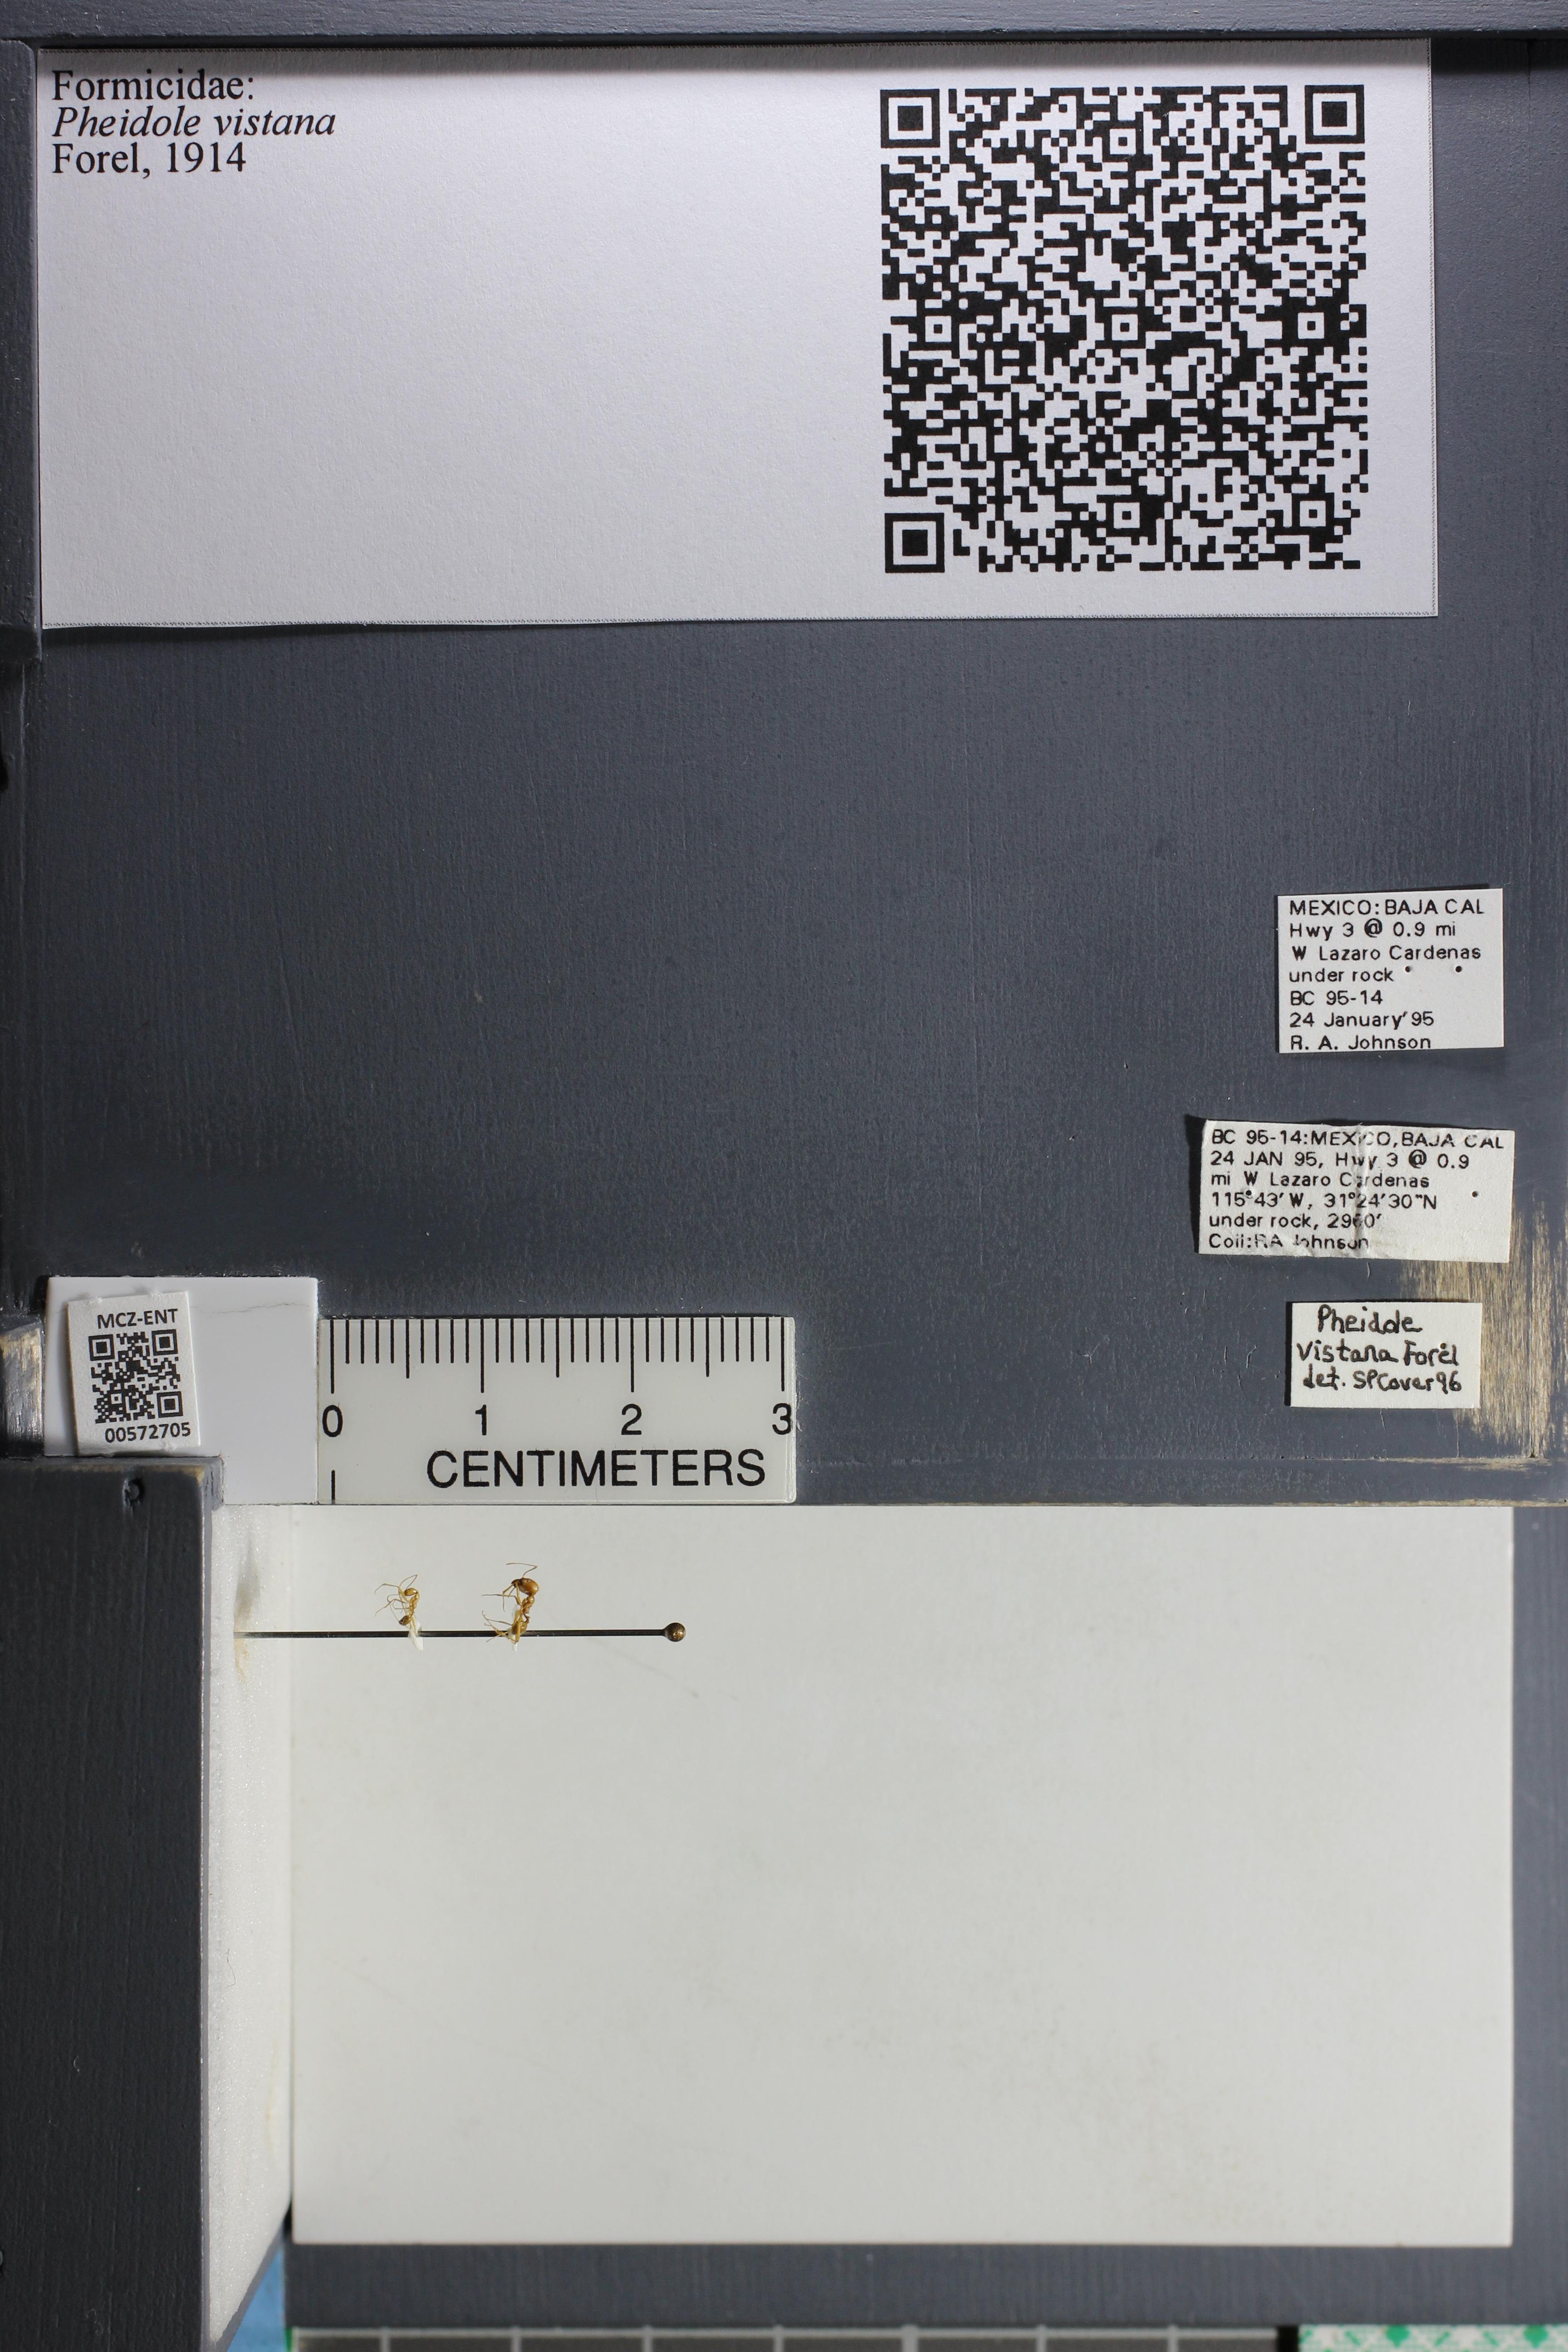 Media of type image, MCZ:Ent:572705 Identified as Pheidole vistana.